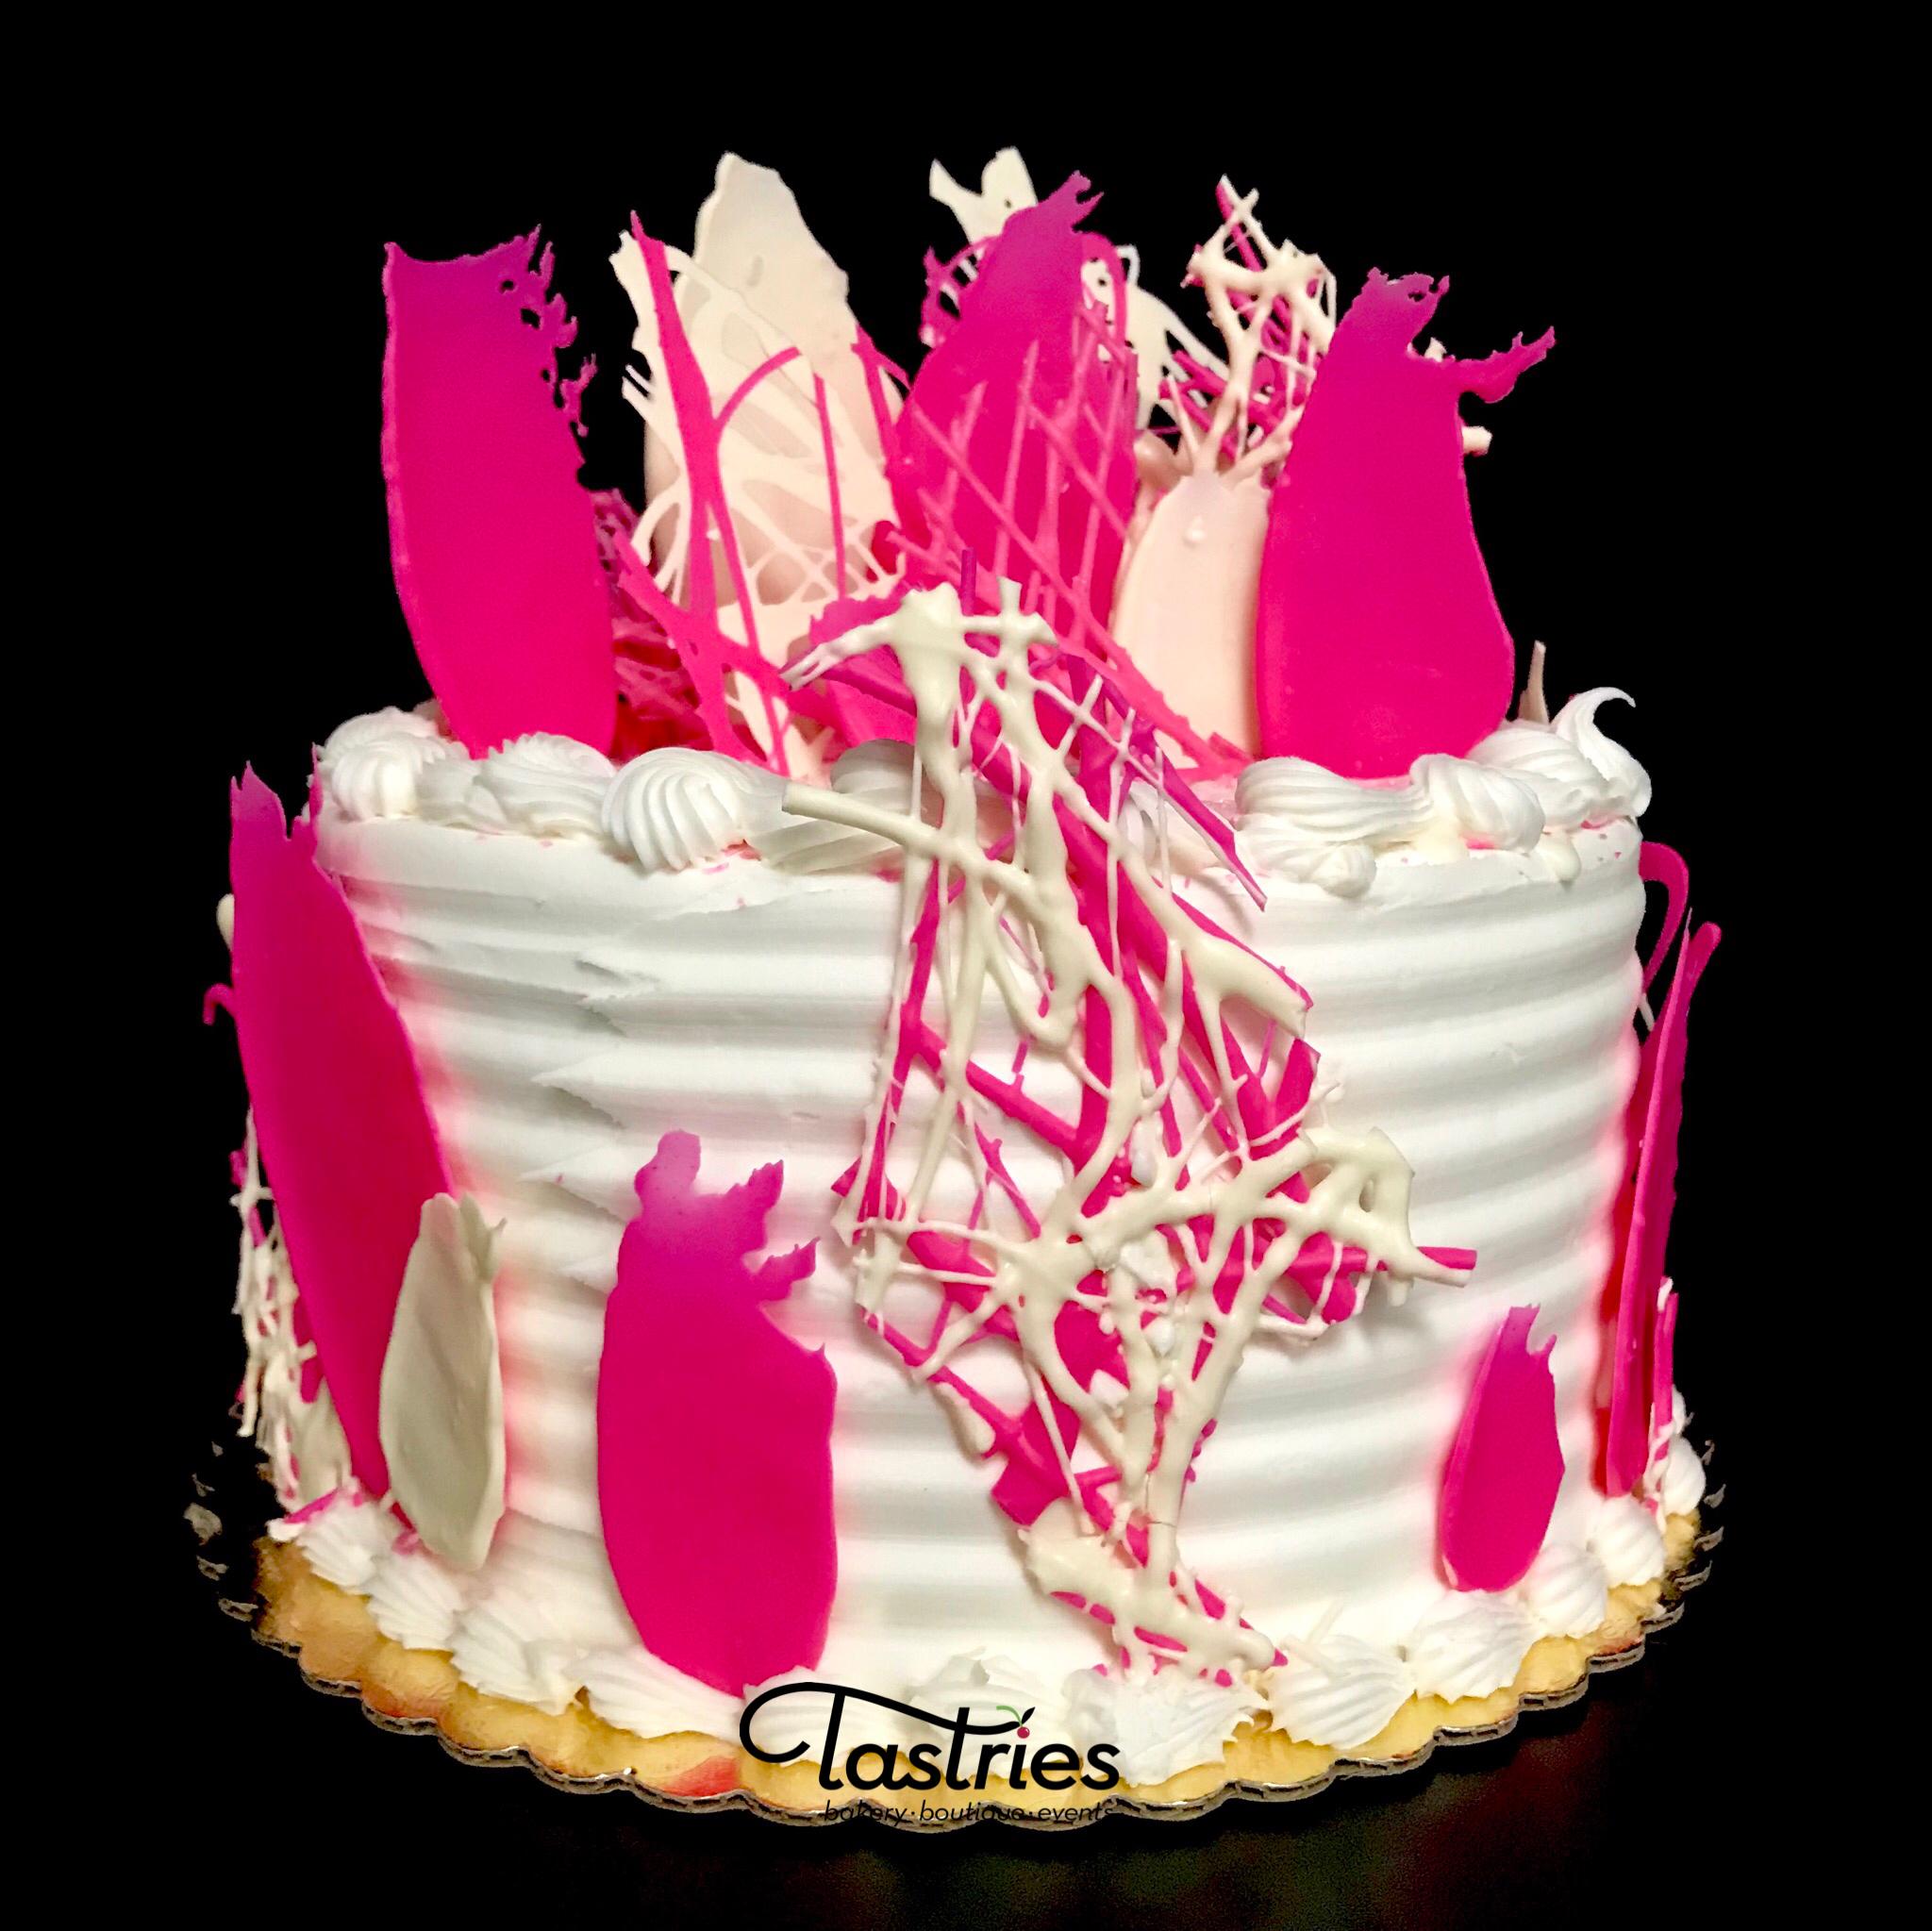 Pink Dessert Cake, Tastries Bakery